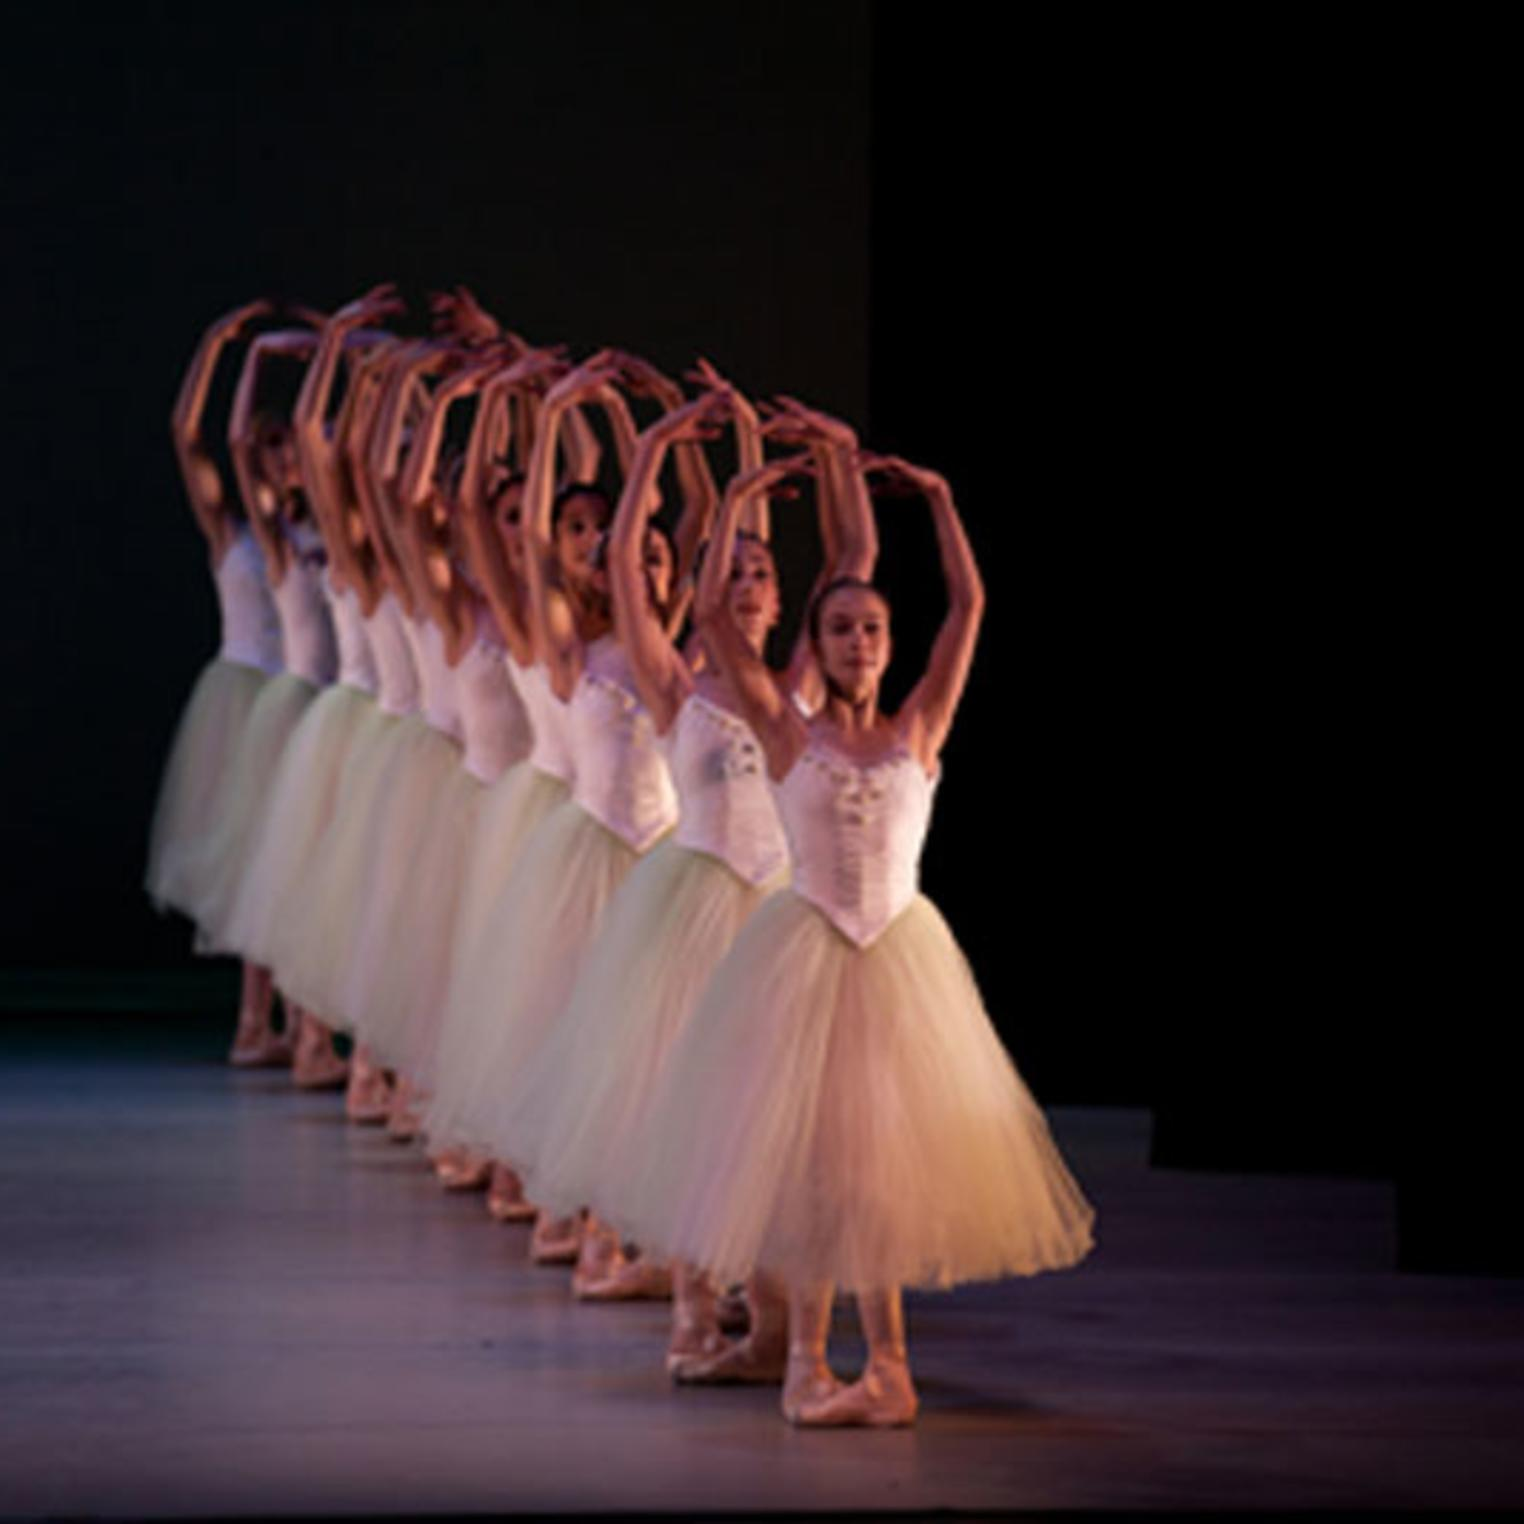 Sans Souci, choreography by Alan Hineline